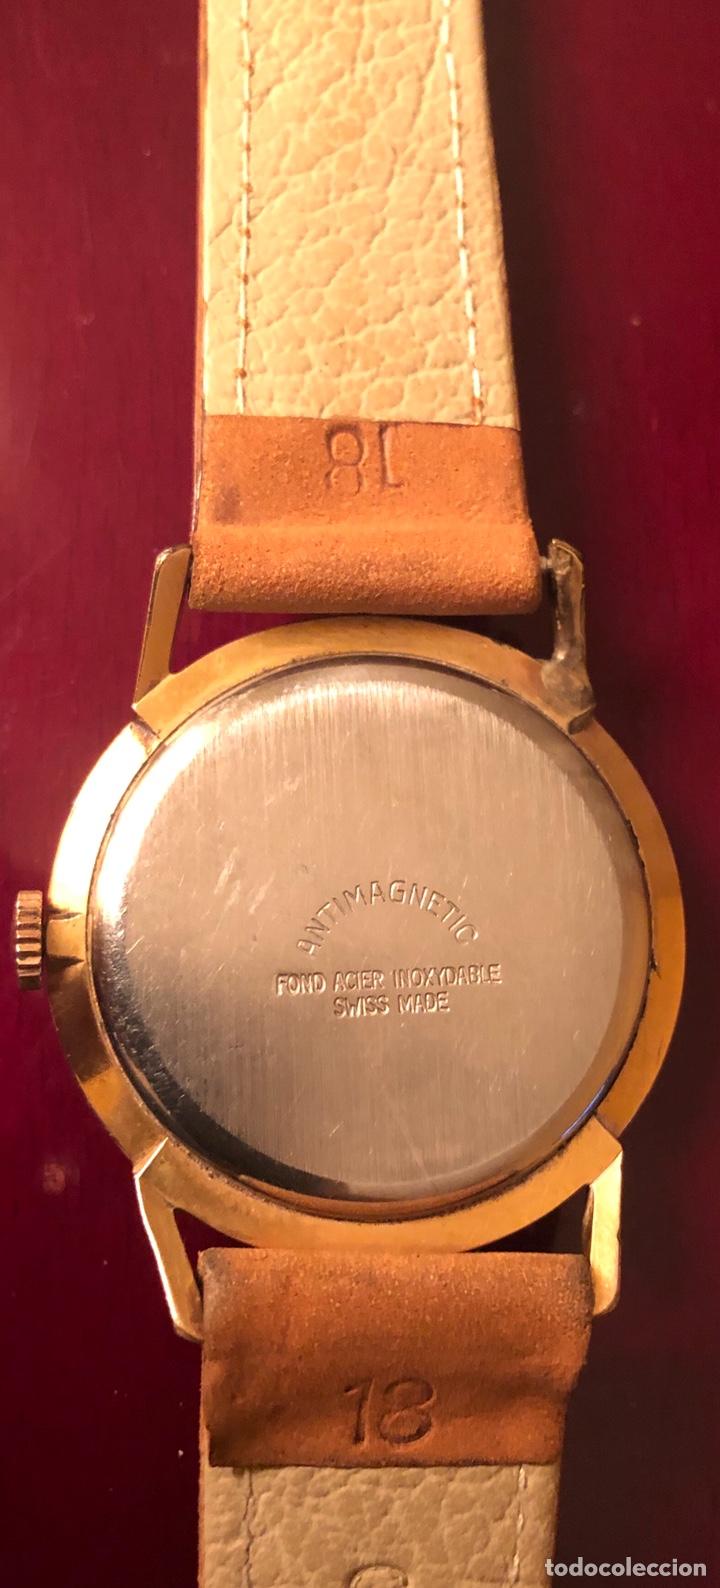 Relojes de pulsera: Reloj de pulsera, de carga manual Radiant - Foto 4 - 165407626